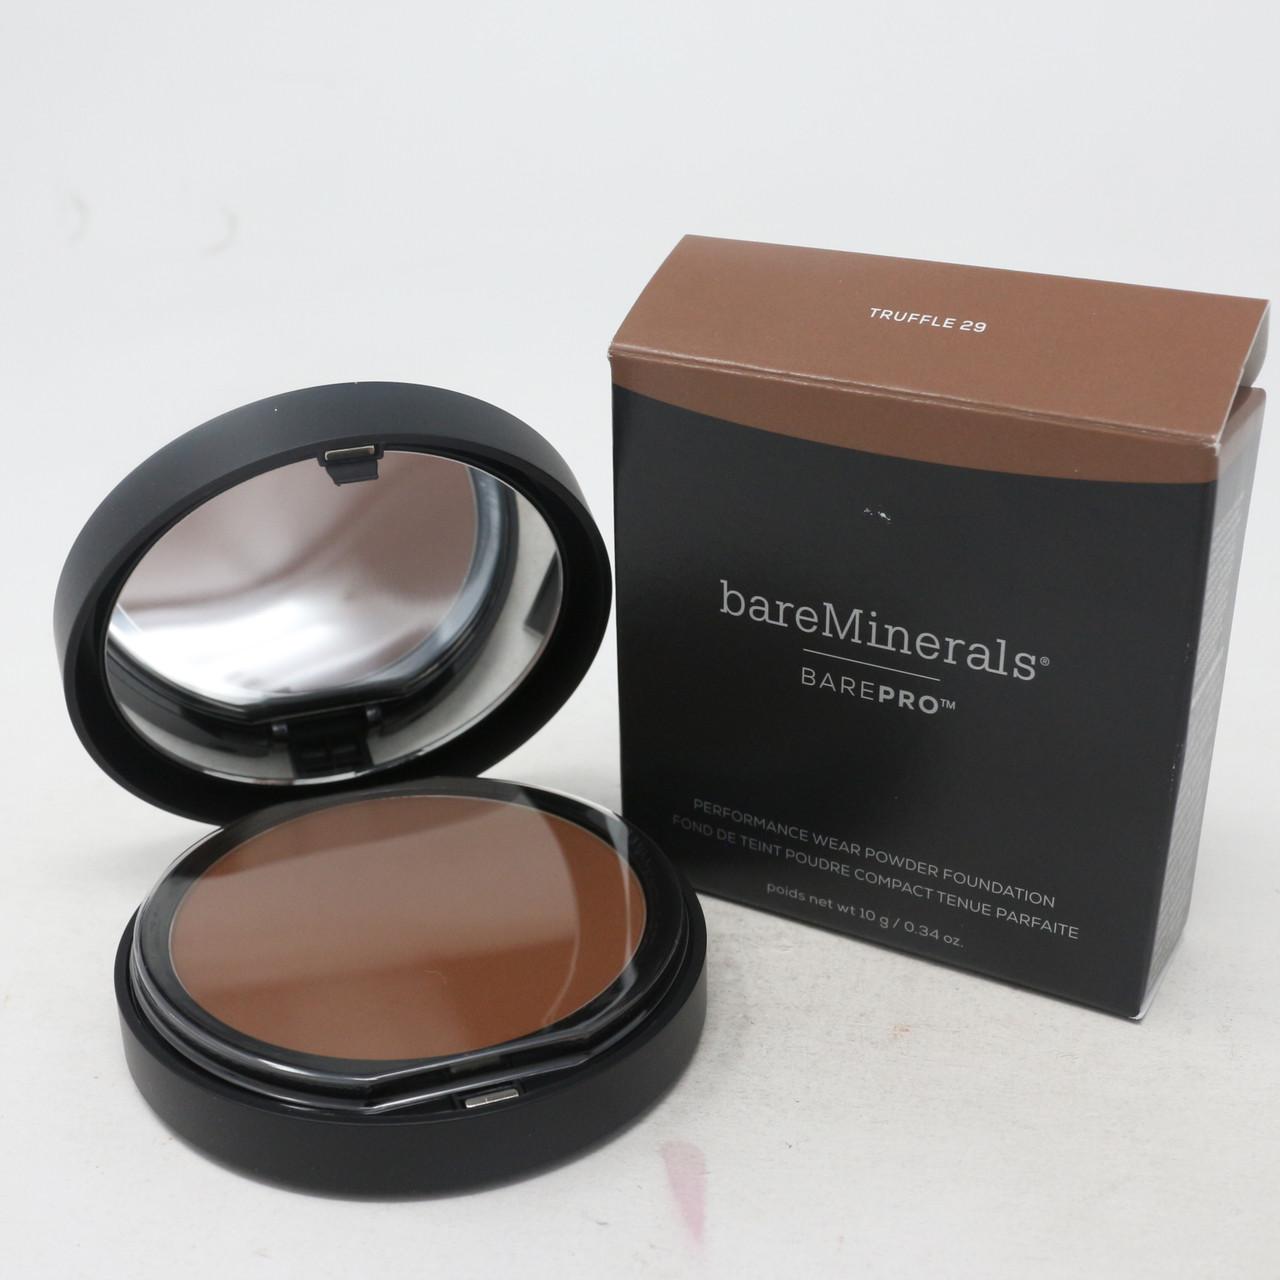 Bareminerals Barepro Performance Wear Powder Foundation 0 34oz 10g New With Box